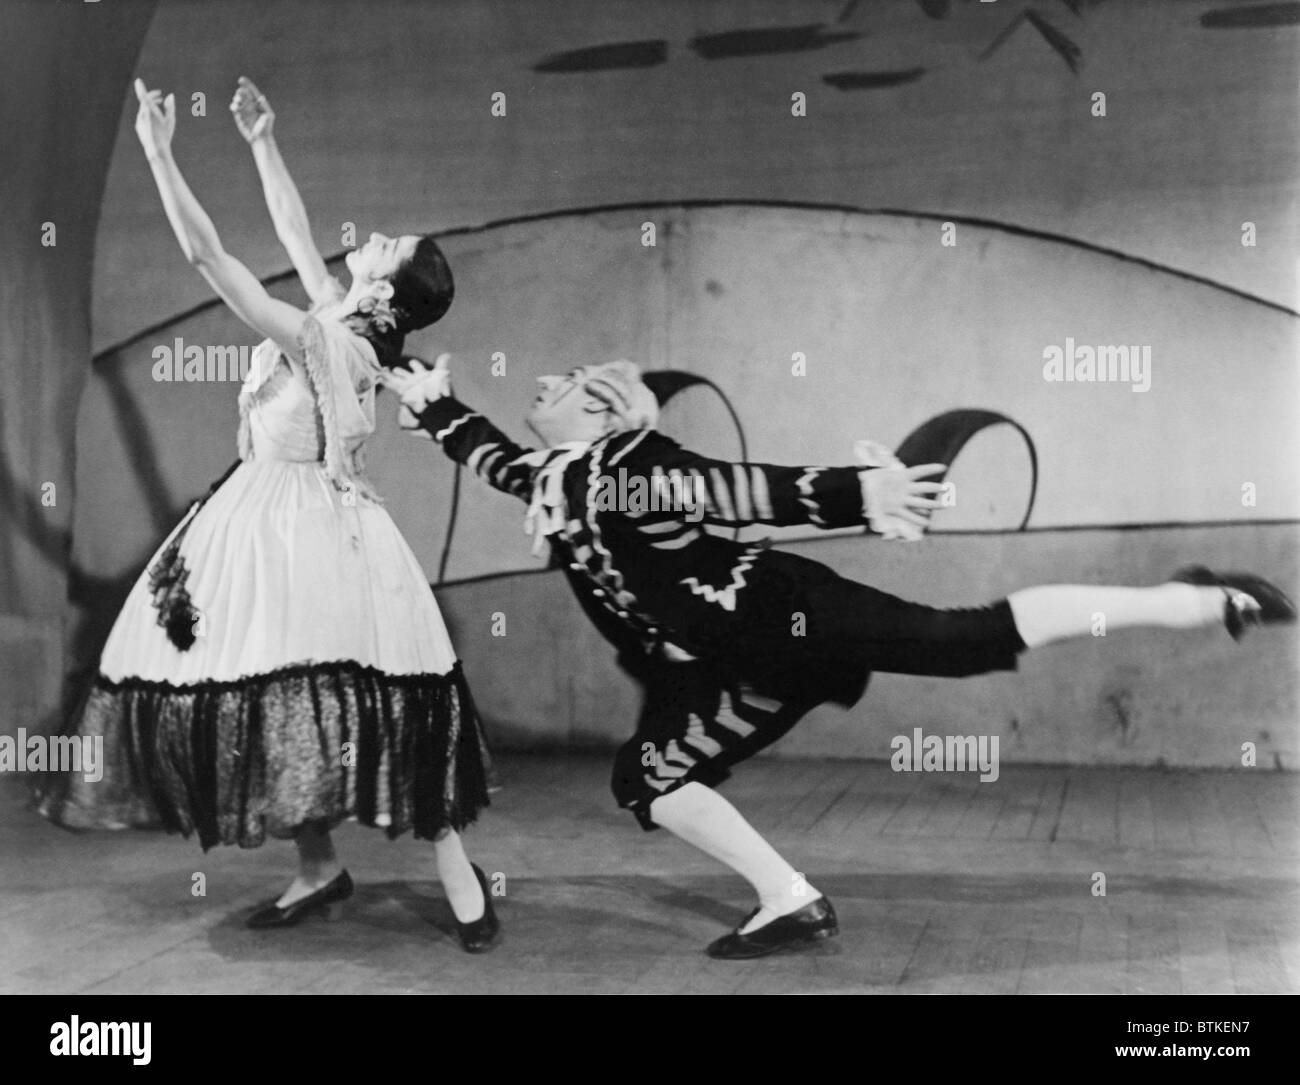 Margot Fonteyn (1919-1991), and John Hart (b. 1921) performing the ballet THREE CORNERED HAT, produced by Sadlers - Stock Image